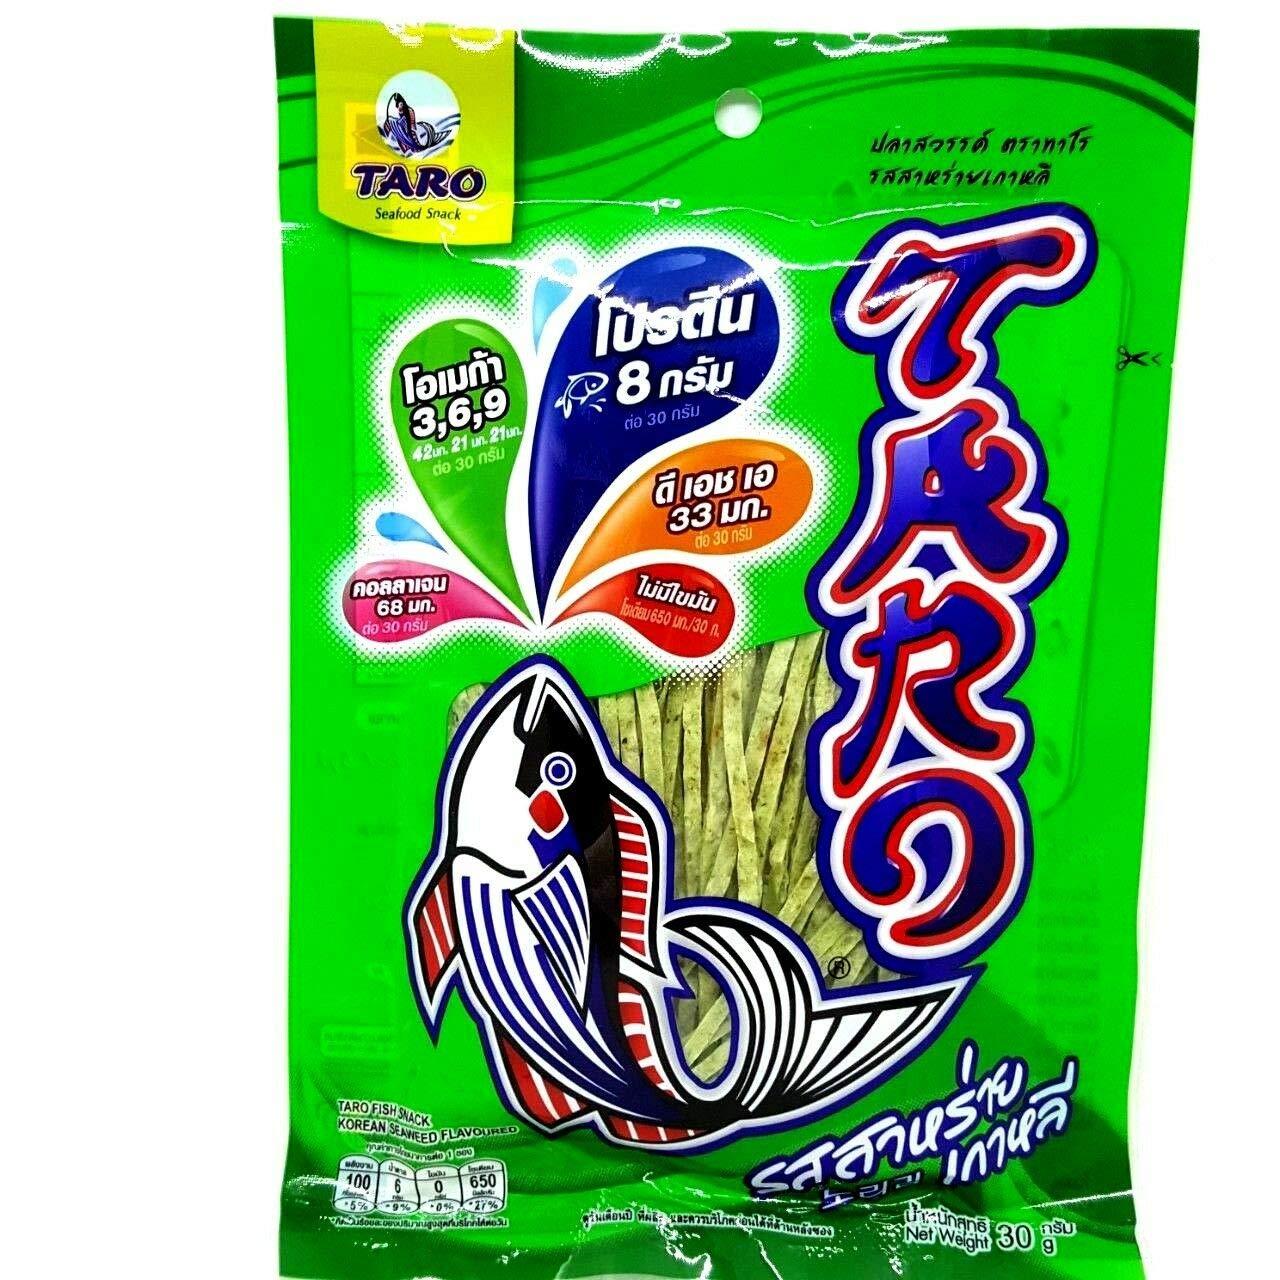 TARO-Thai Fish Snack Dried Food Low Fat Korean Seaweed Flavored (Pack of 6)